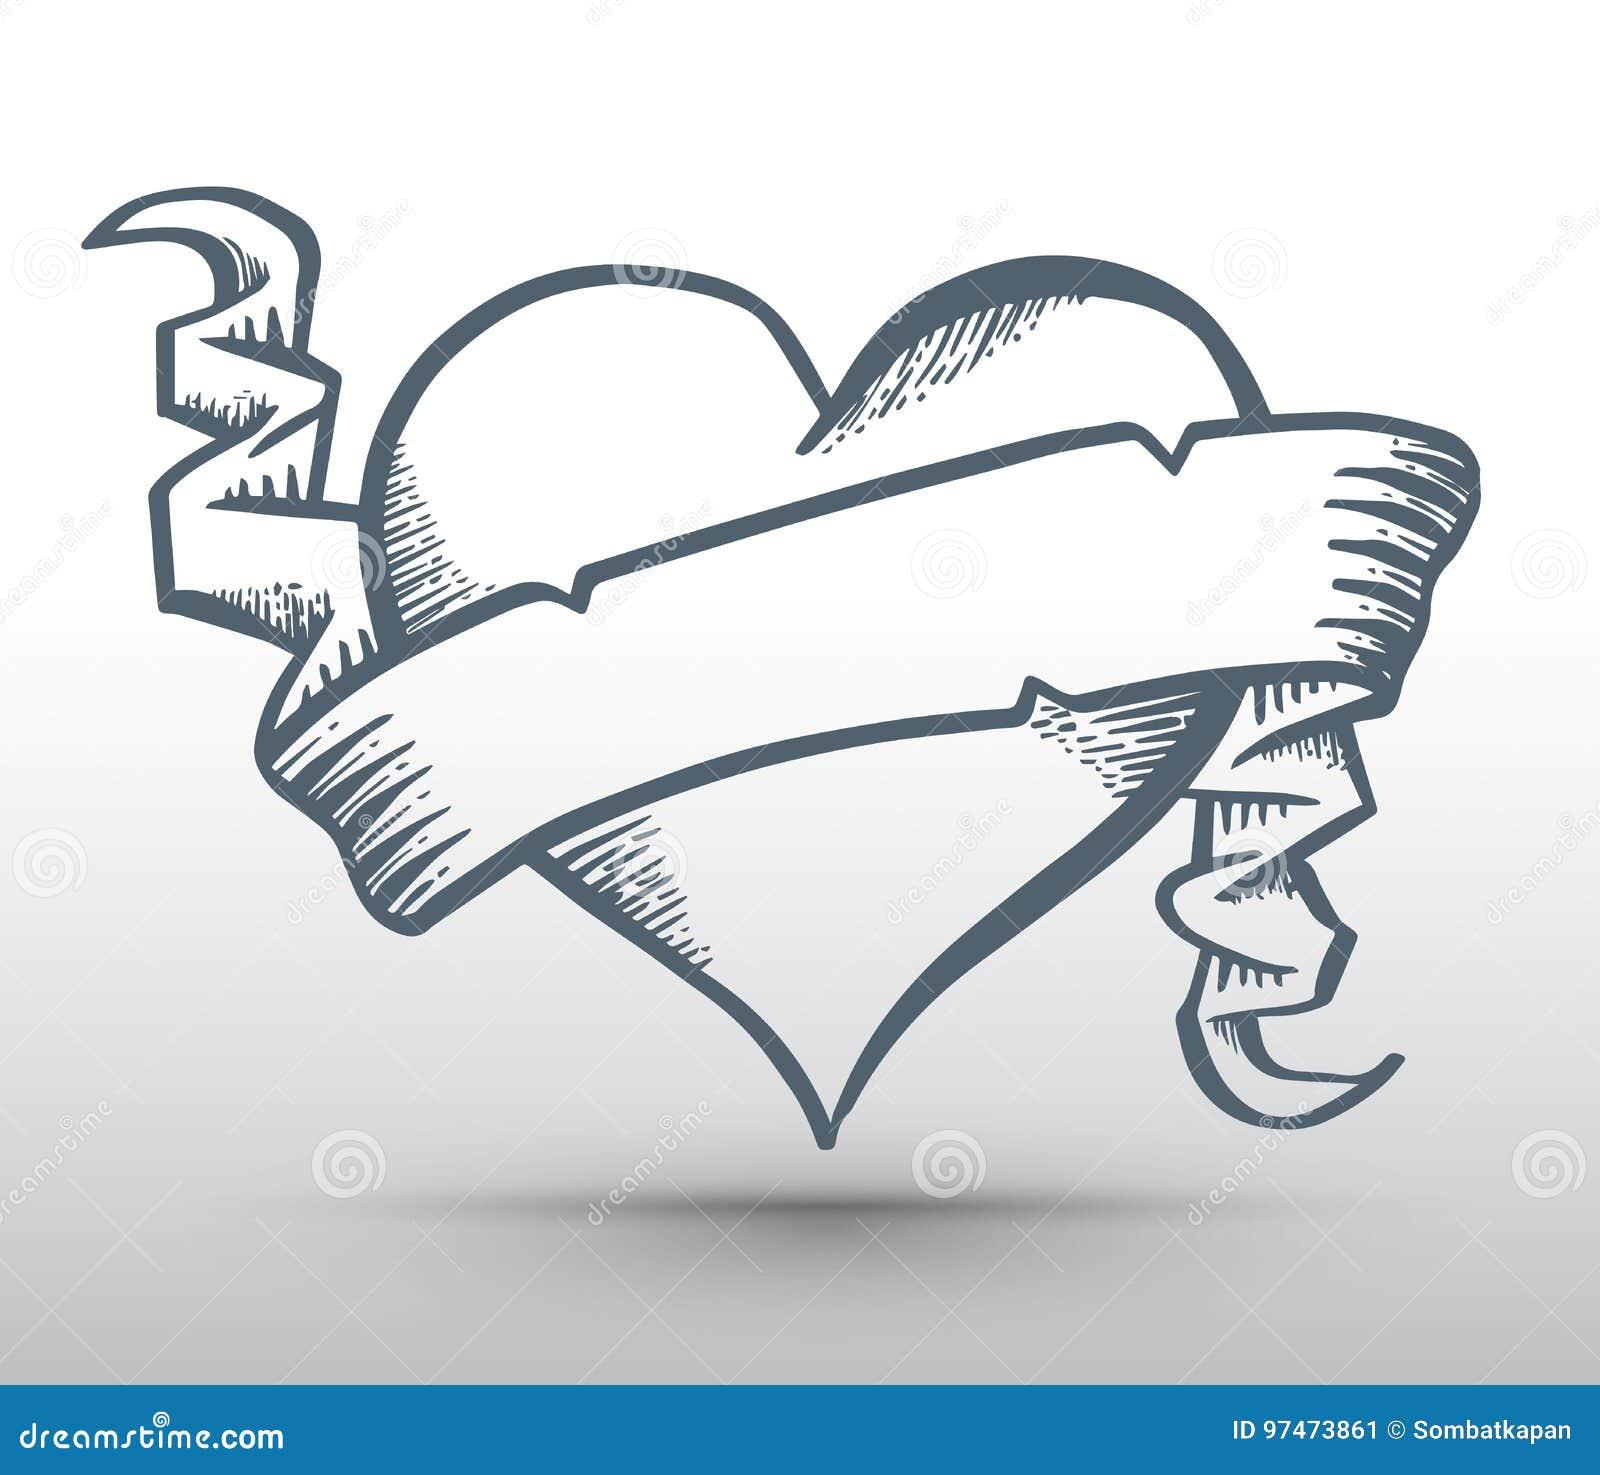 Dessin Ruban coeur avec la bannière de dessin de ruban illustration de vecteur